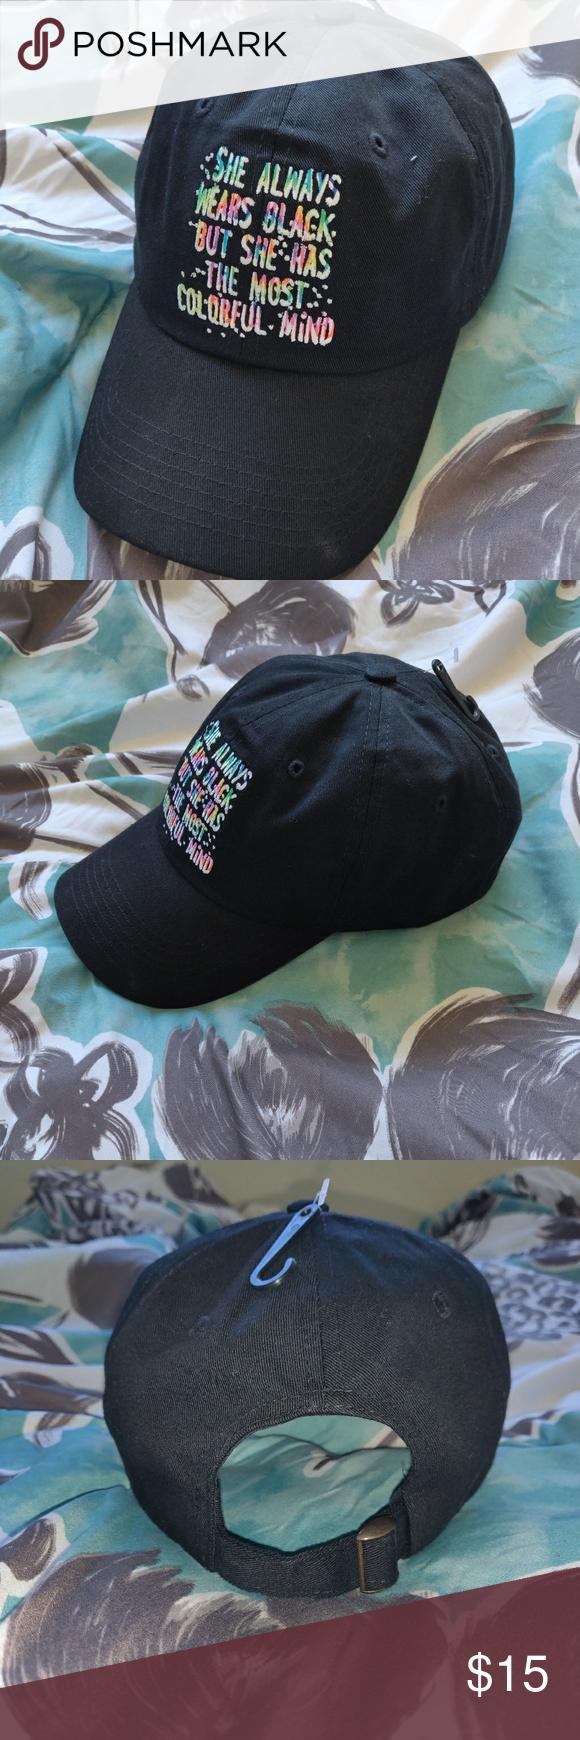 95b4ea320f4bf Colorful hat